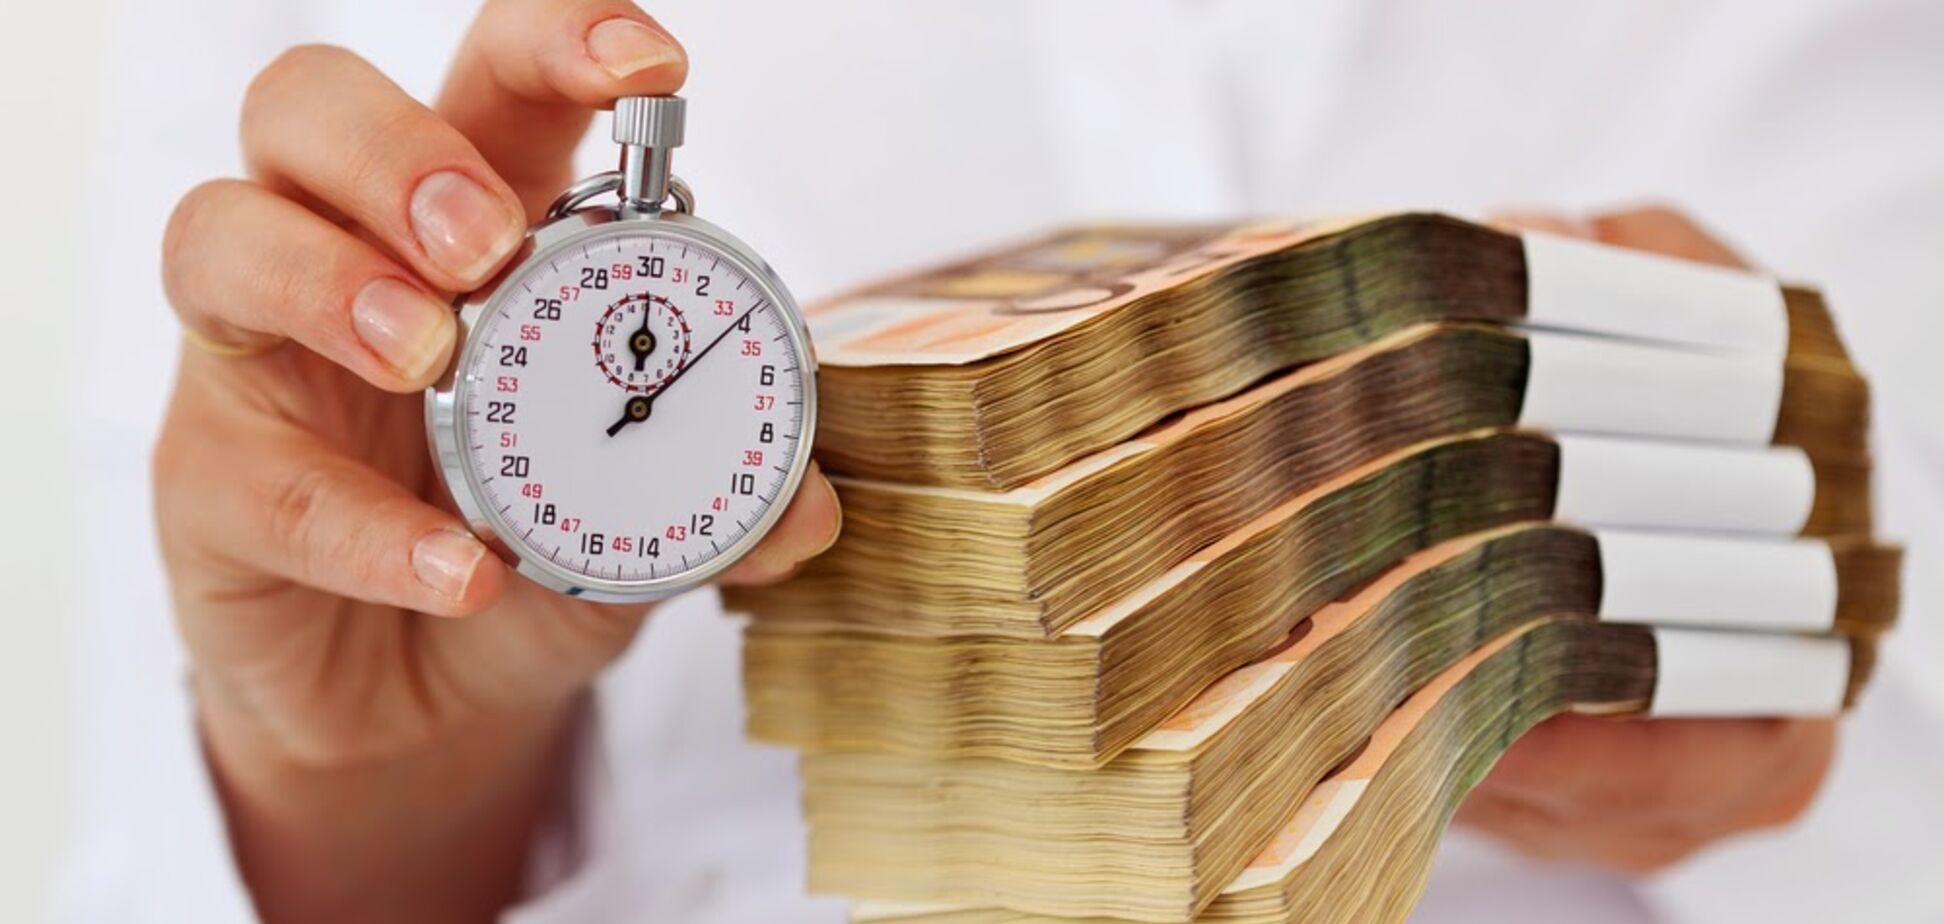 Украинцы каких знаков зодиака чаще всего берут кредиты онлайн — статистика Moneyveo